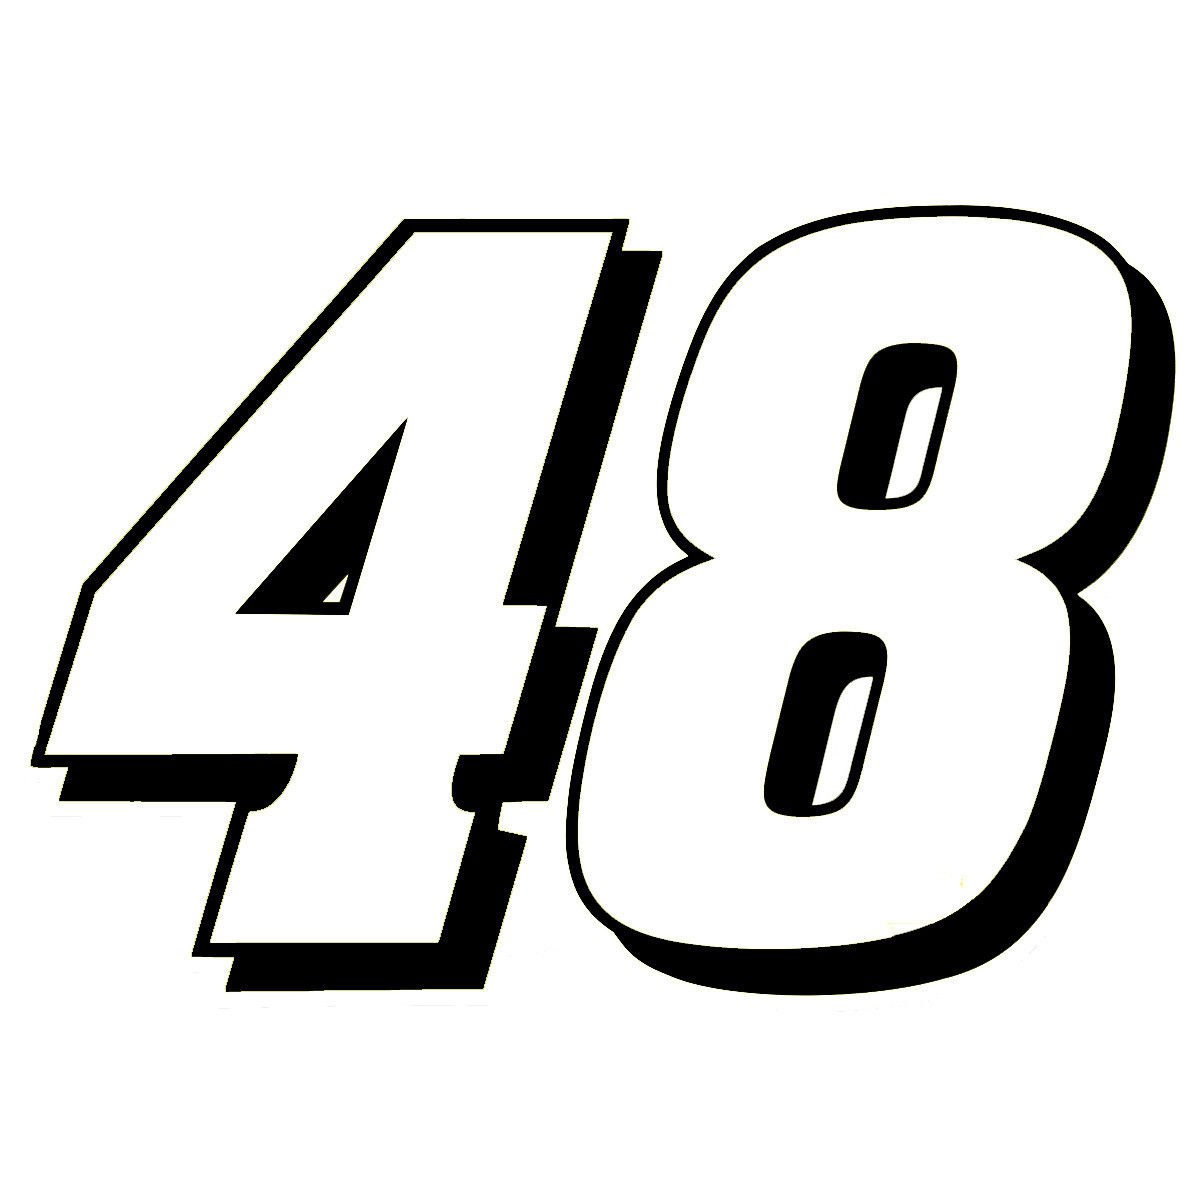 "8"" Jimmie Johnson 48 Window Decal Sticker 48jj-2c8"